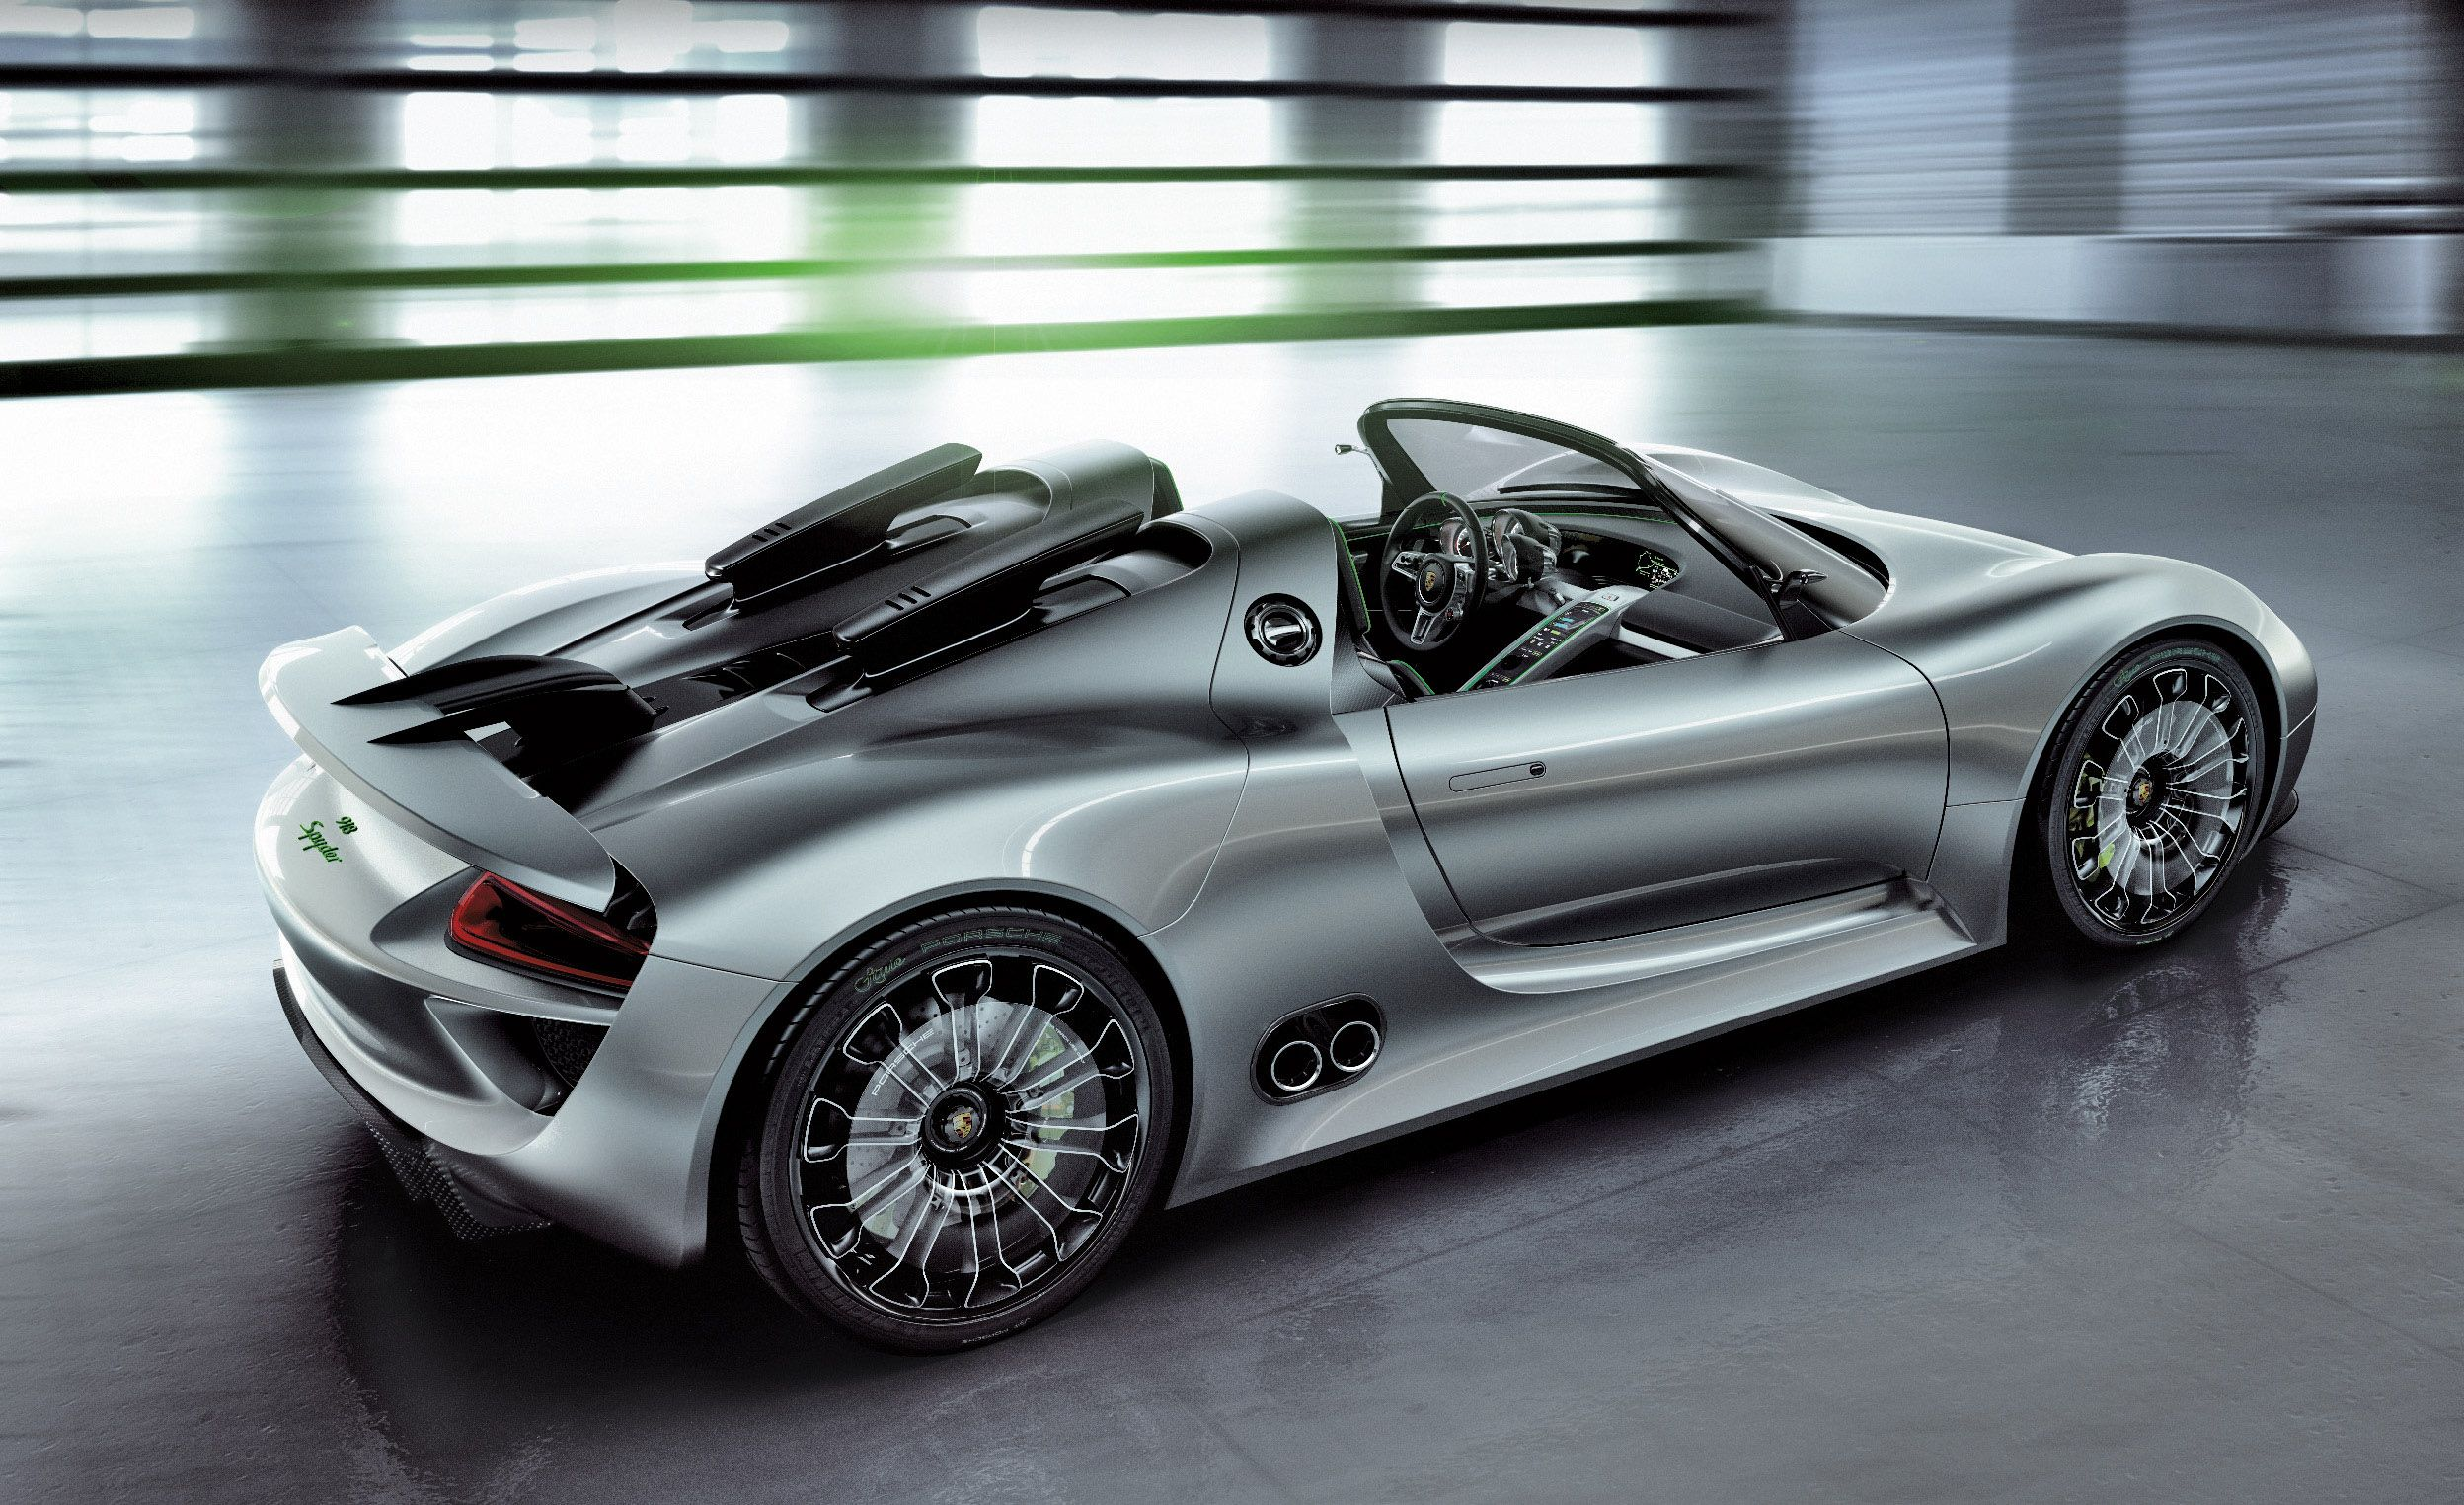 5474c51fe9c10_-_news-porsche-918-spyder-001 Astounding where are Porsche 918 Spyder Location Cars Trend